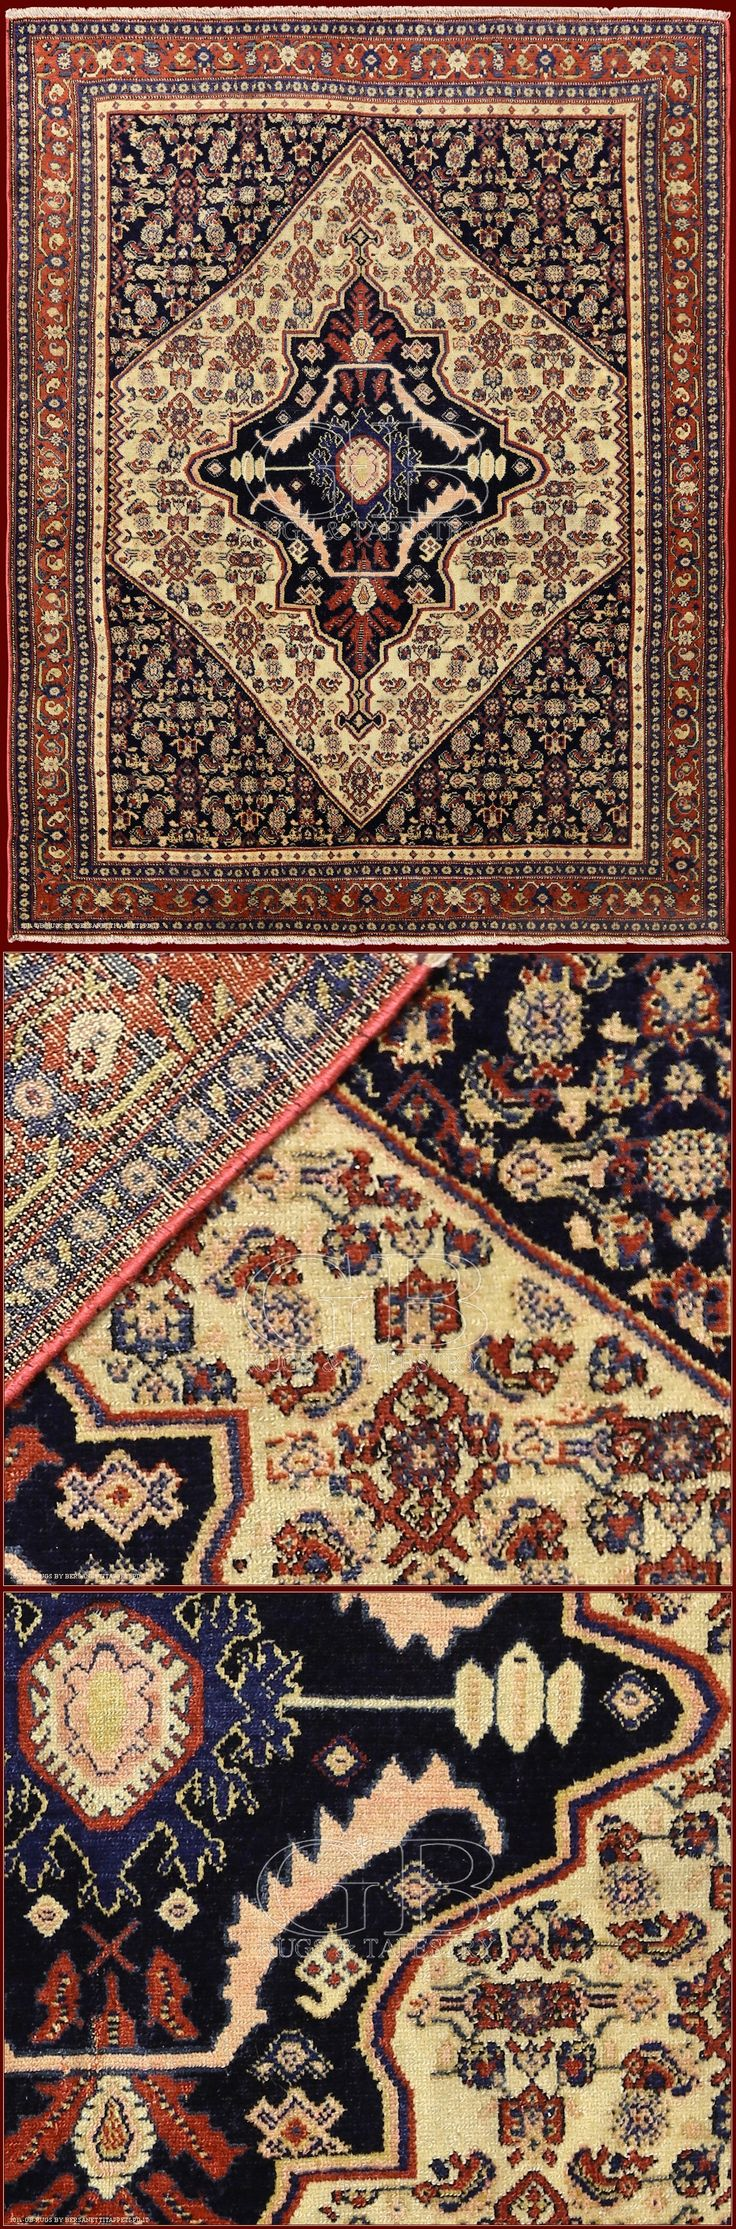 http://www.gb-rugs.com/Tappeti/?psearch=zar&x=0&y=0